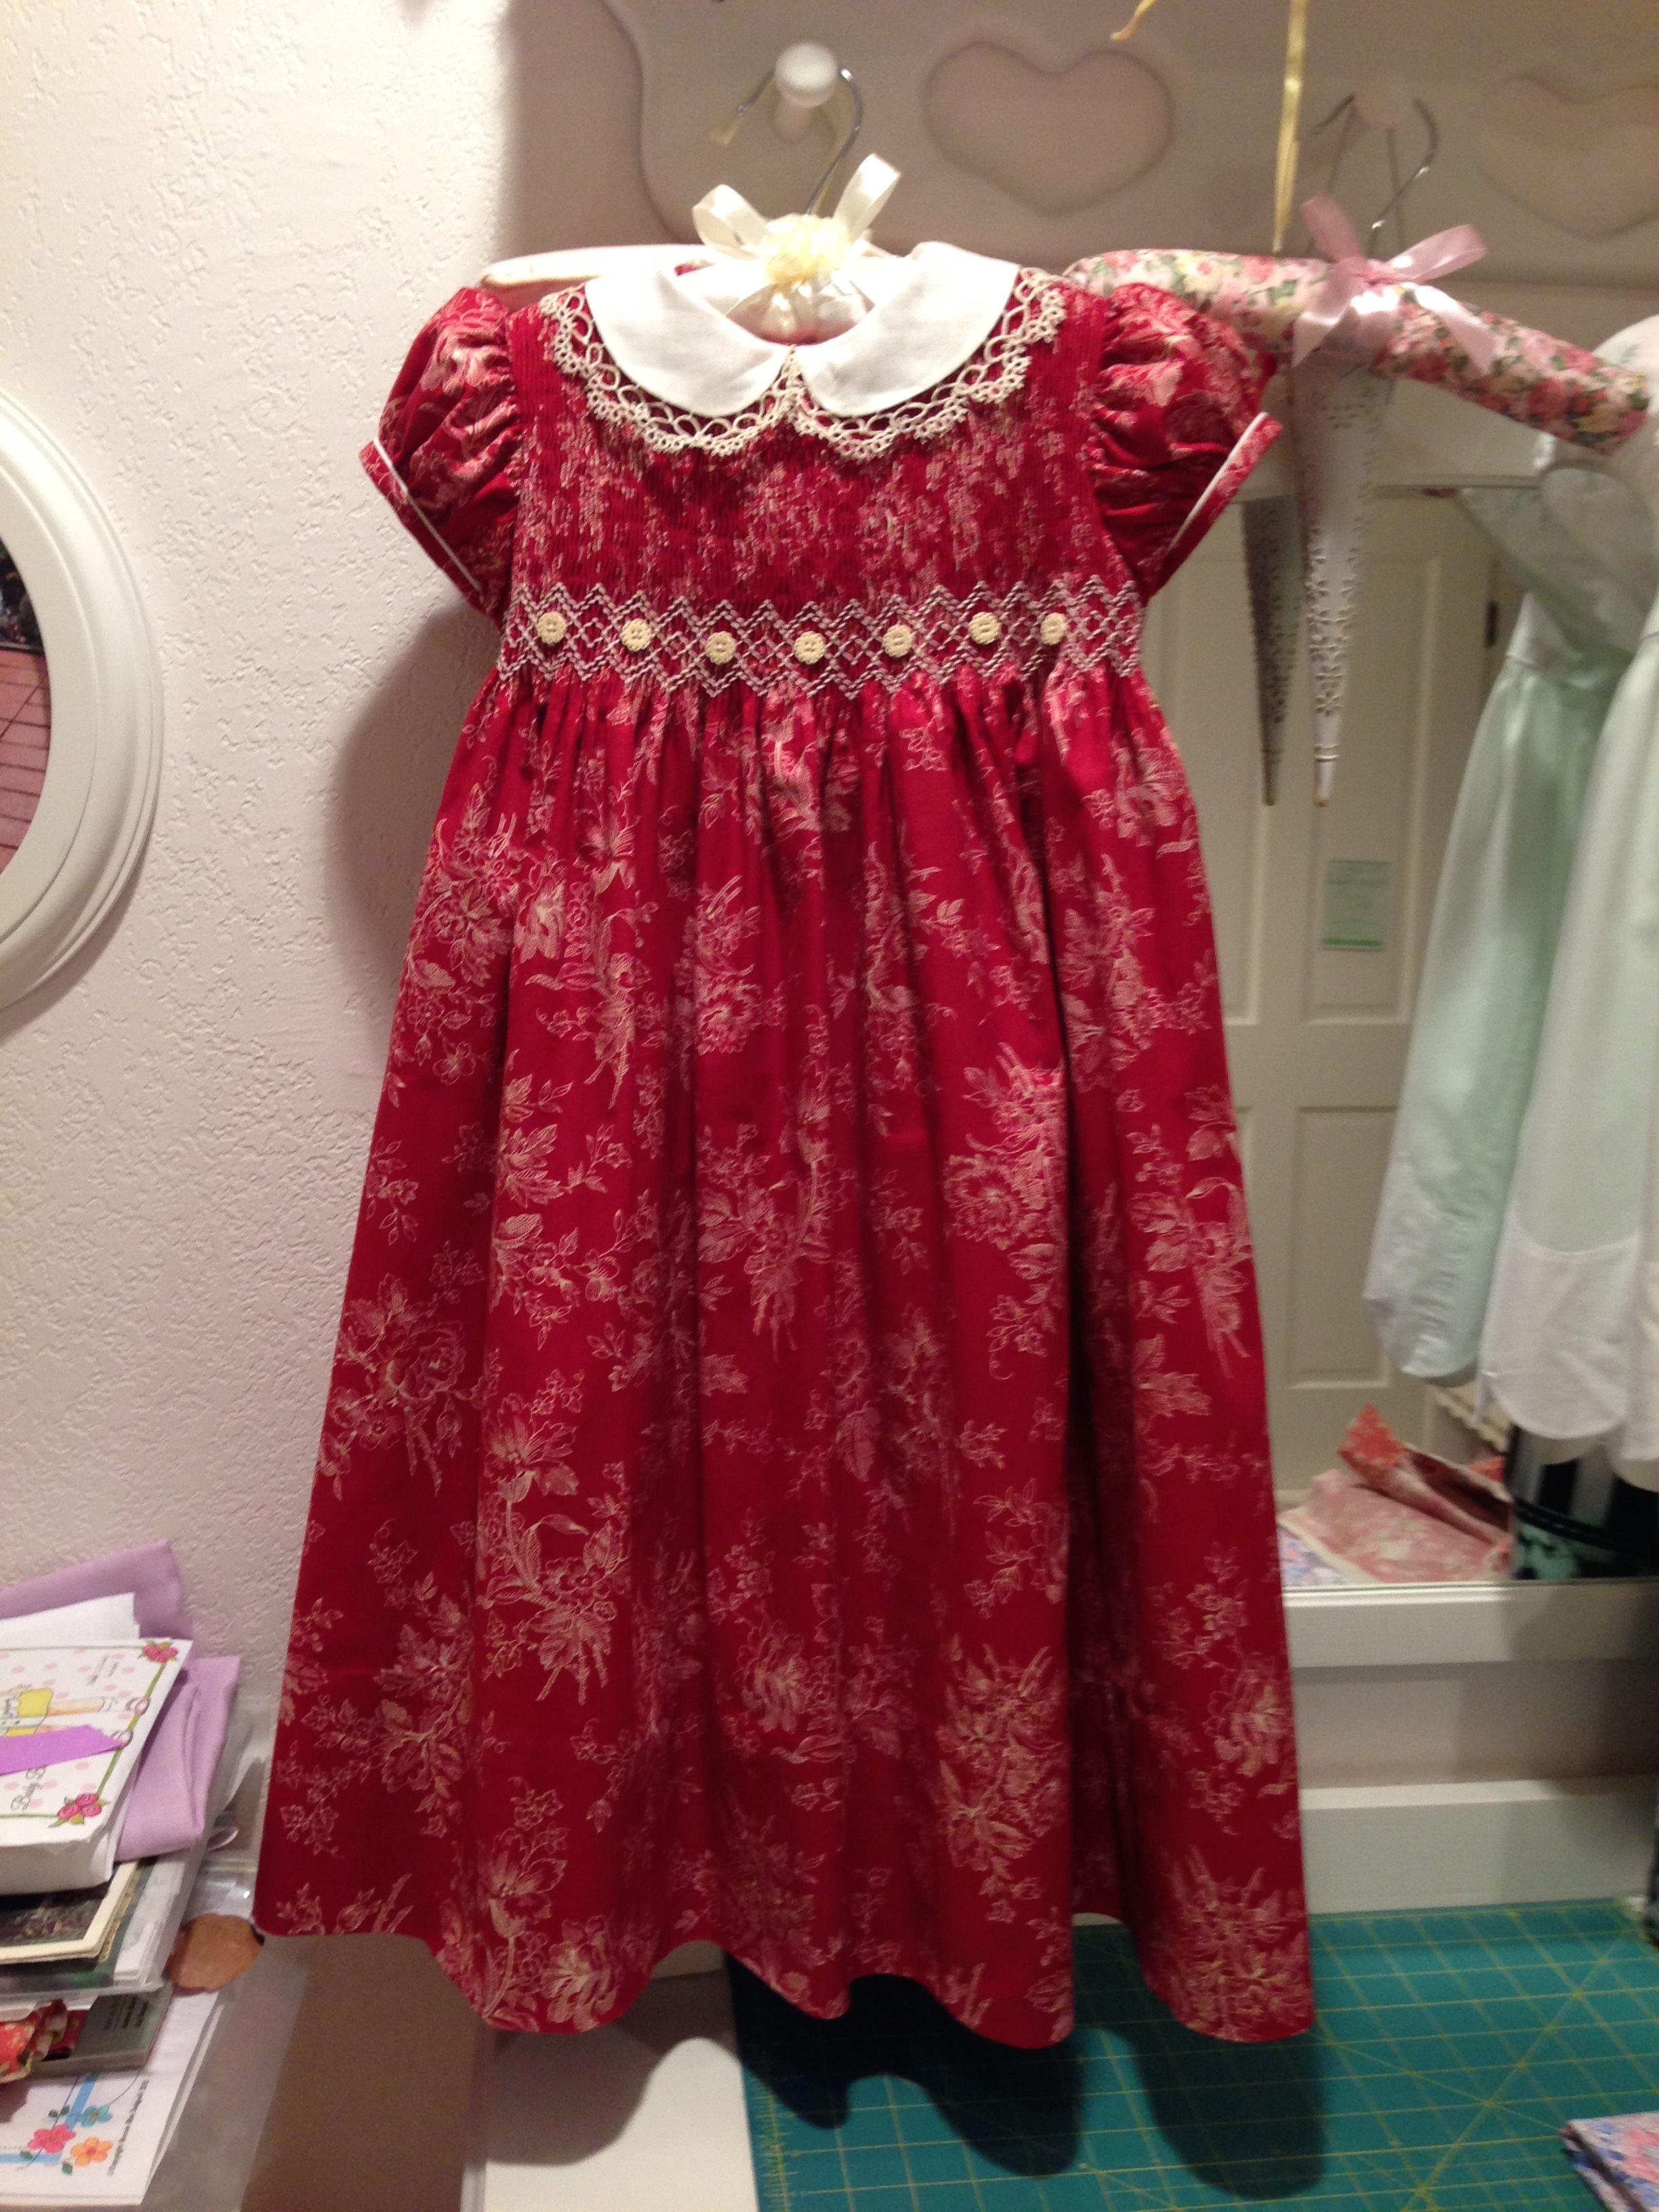 smocked Christmas dress | Smocked baby dresses, Smocked ...